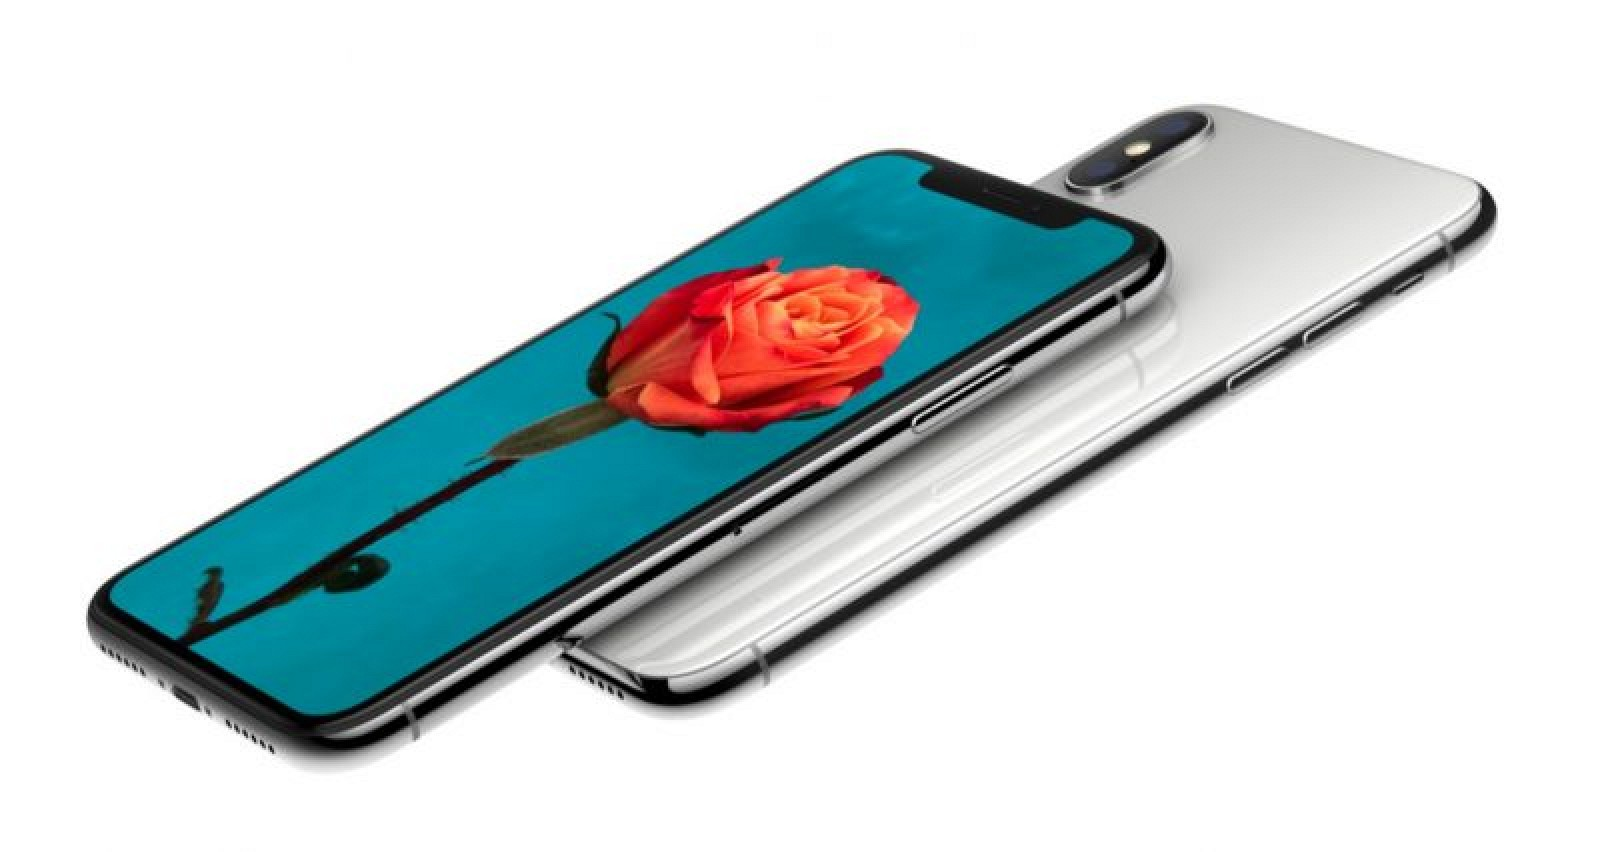 Apple представили 5.8-дюймовый 'iPhone X' с Super Retina OLED дисплеем